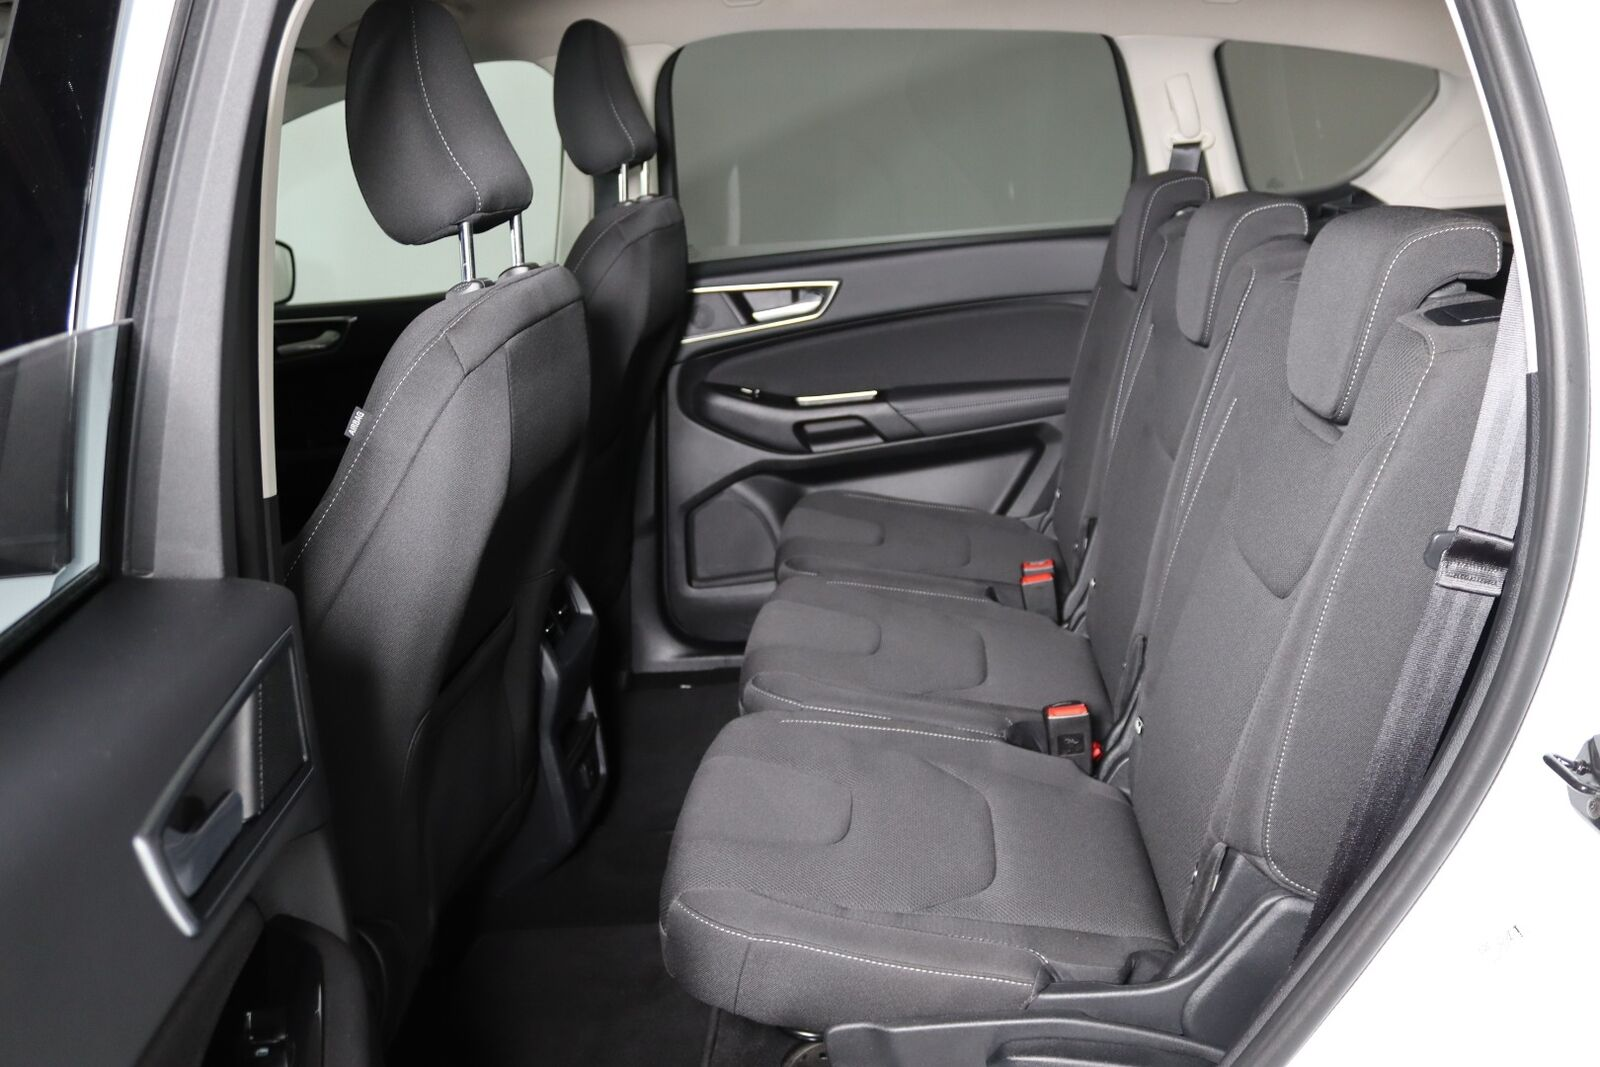 Ford S-MAX 2,0 TDCi 210 Titanium aut. 7prs - billede 6